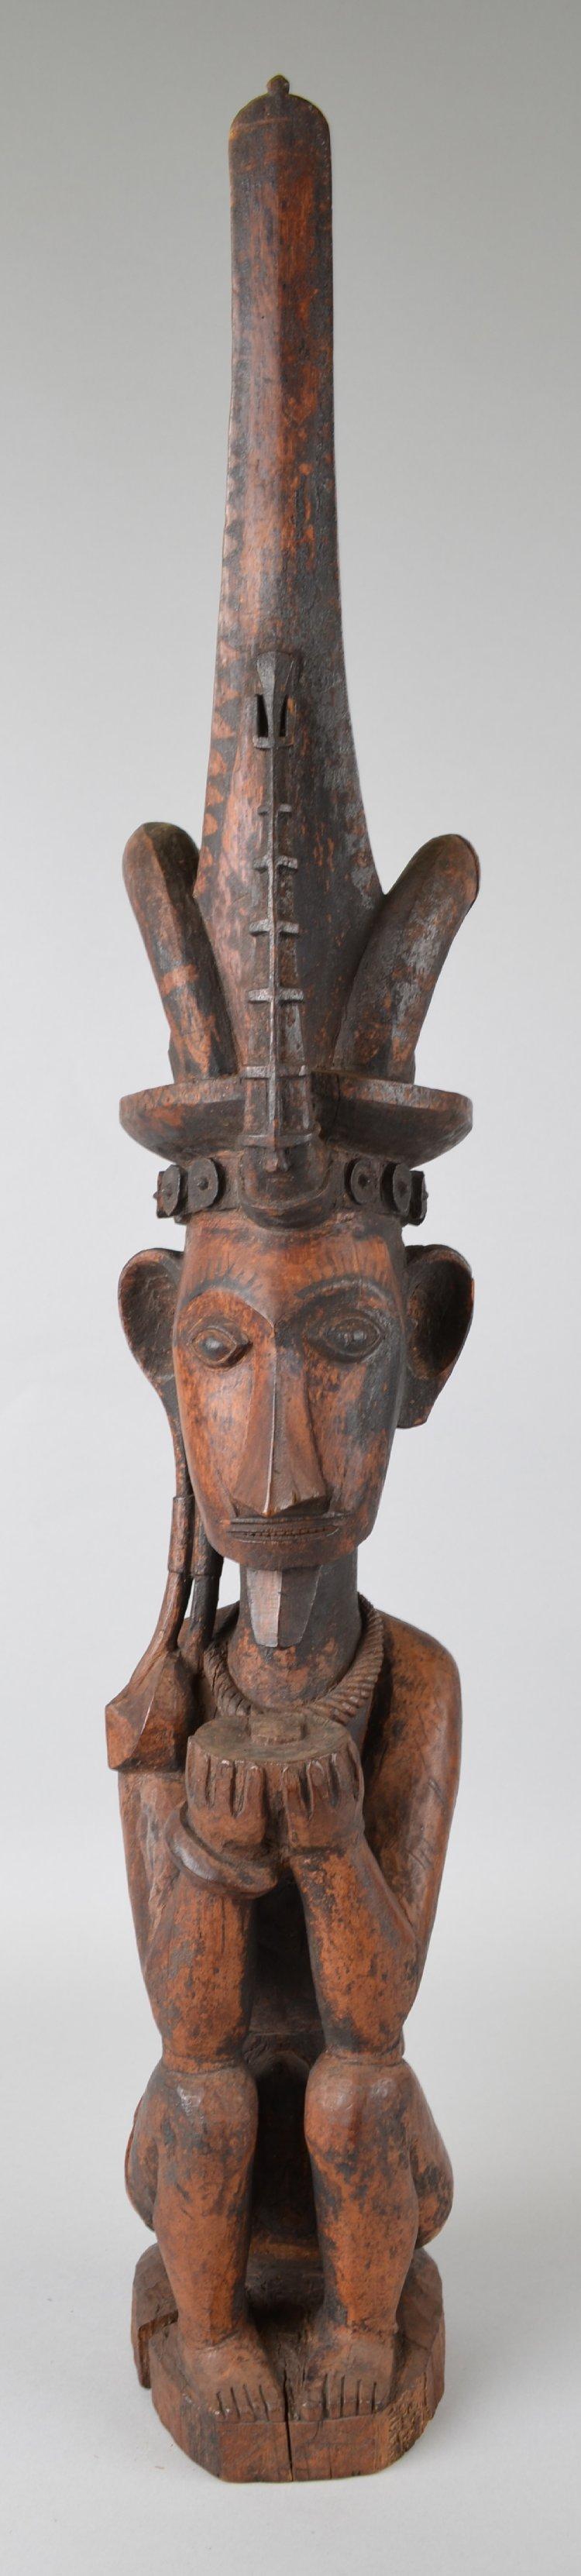 Seated Male Ancestor Figure |  Adu Sihara Salawa  © The British Museum | United Kingdom